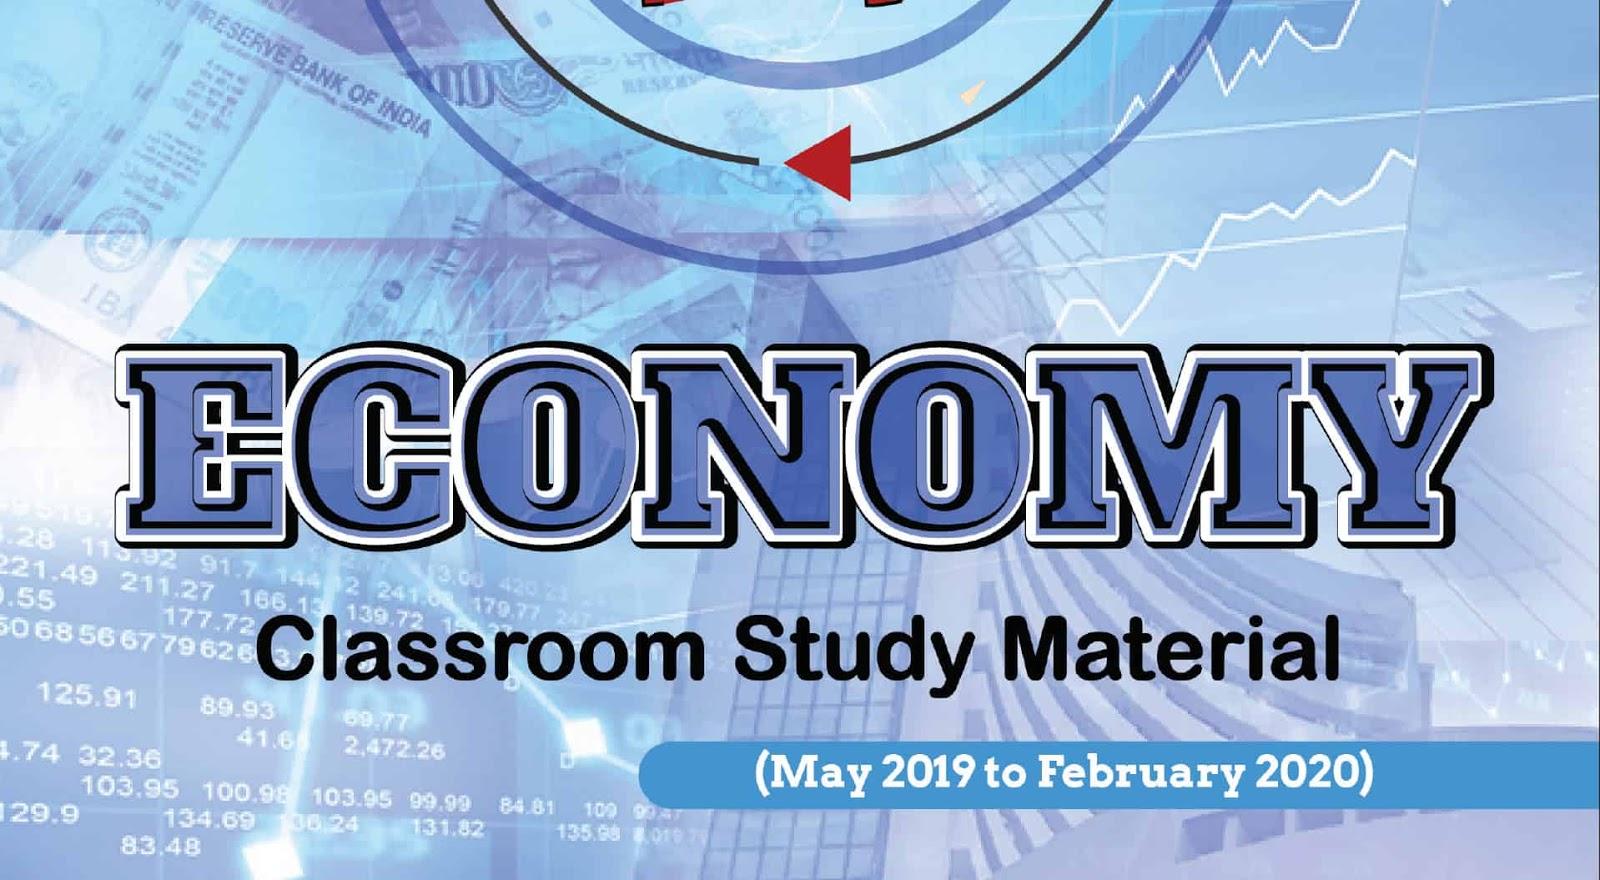 Vision IAS PT 365 Economy 2020 pdf